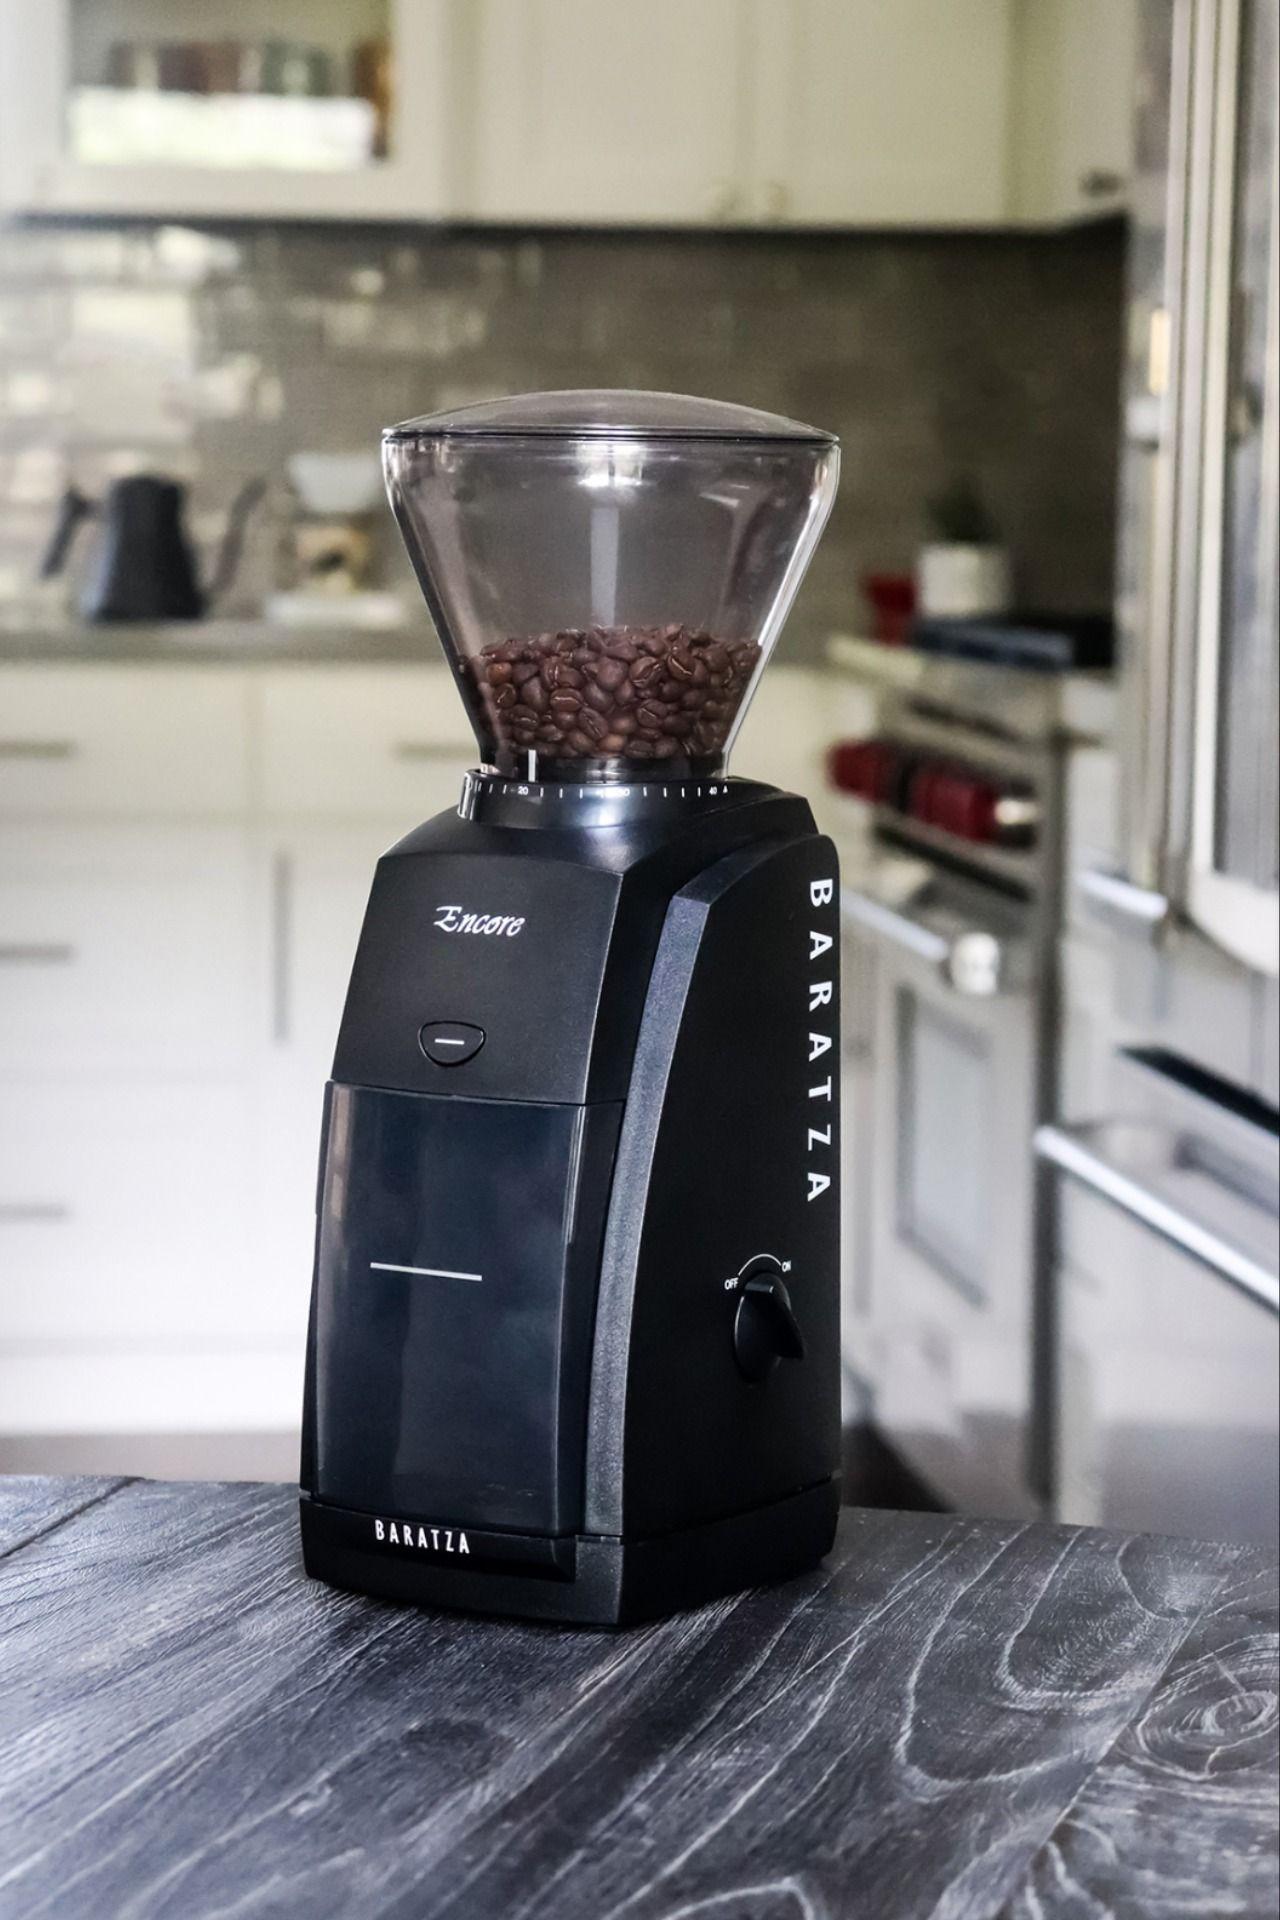 Baratza Encore Conical Burr Coffee Grinder, Black in 2020